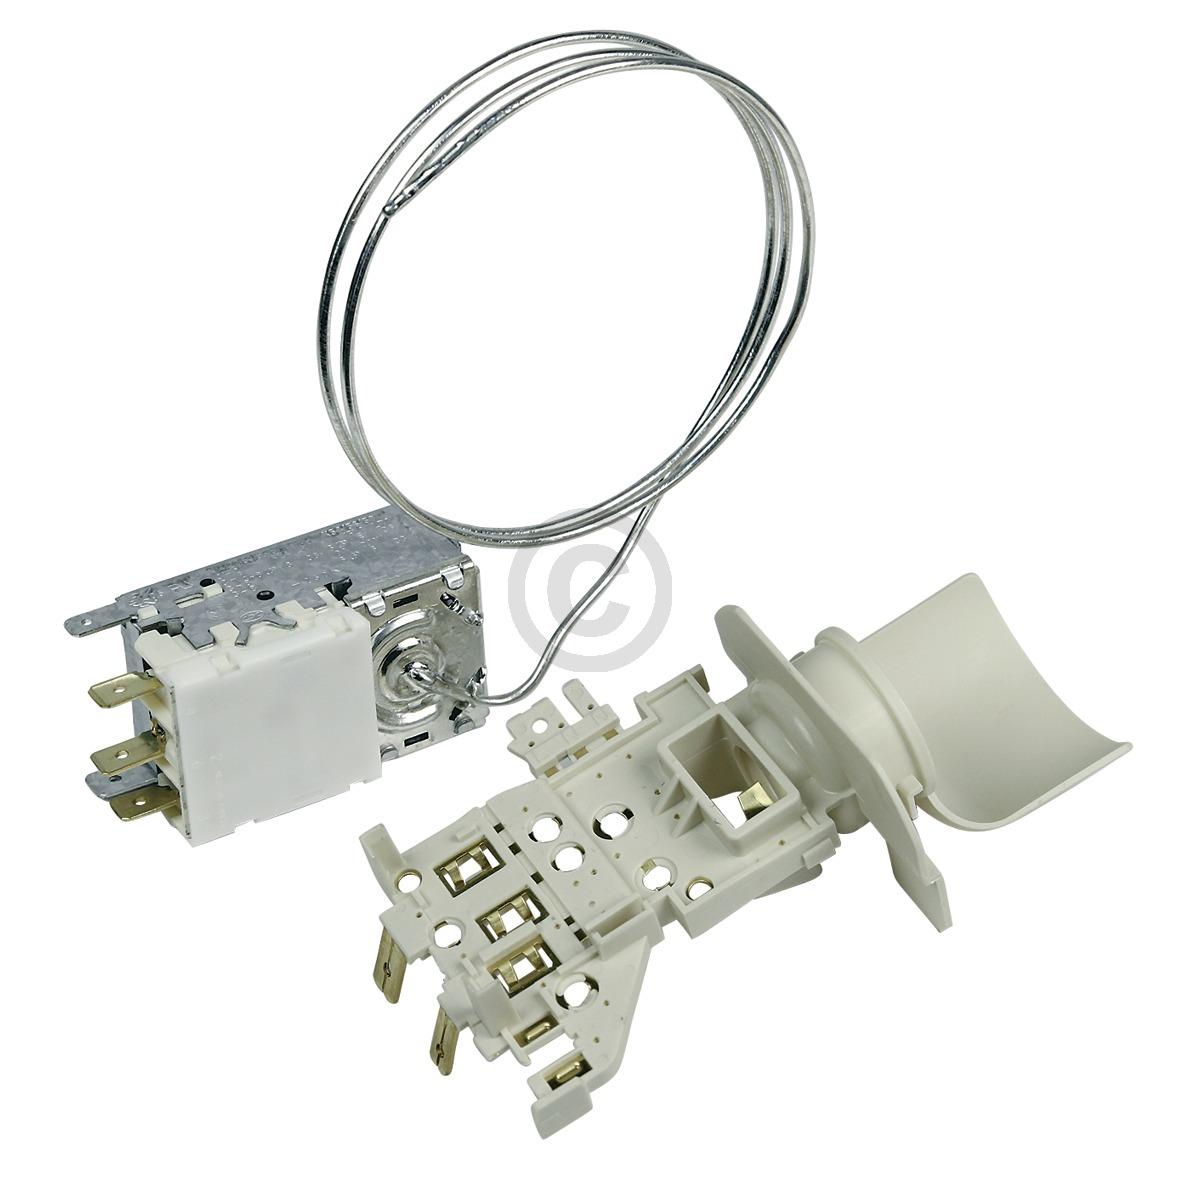 Thermostat K59-S1880 Ranco mit Lampenfassung Whirlpool 481228238231